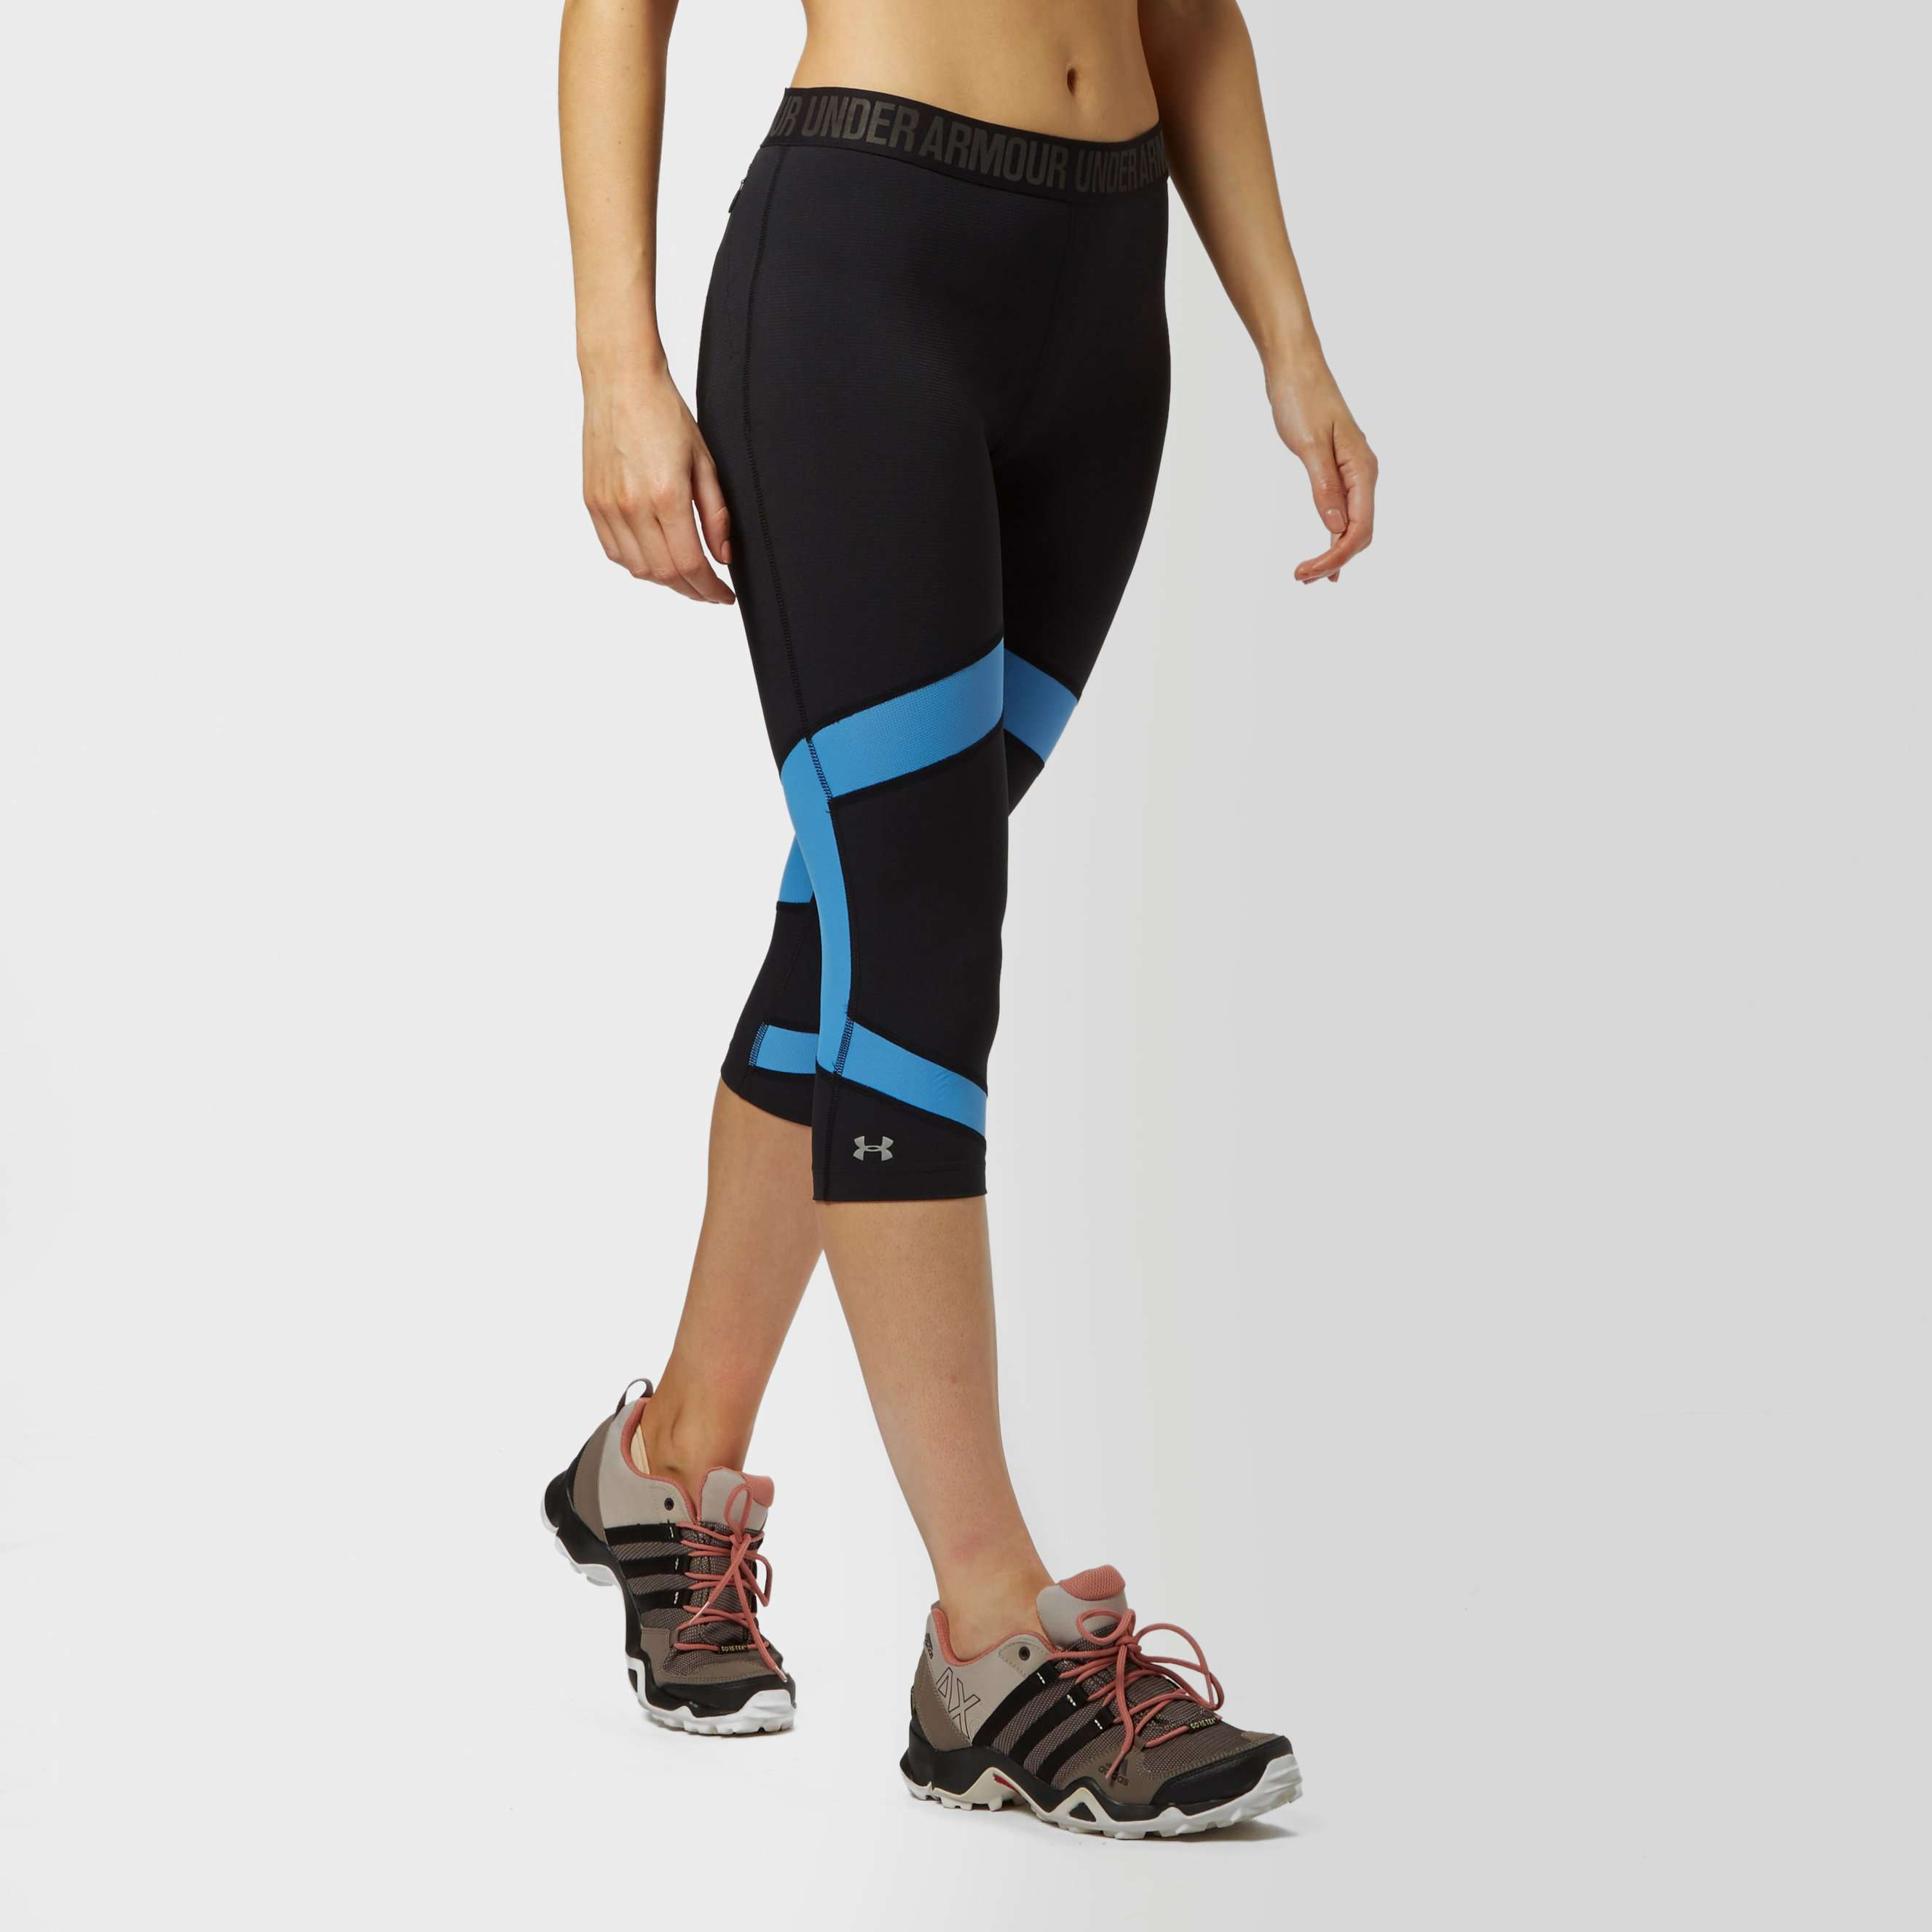 UNDER ARMOUR Women's UA CoolSwitch Capri Leggings